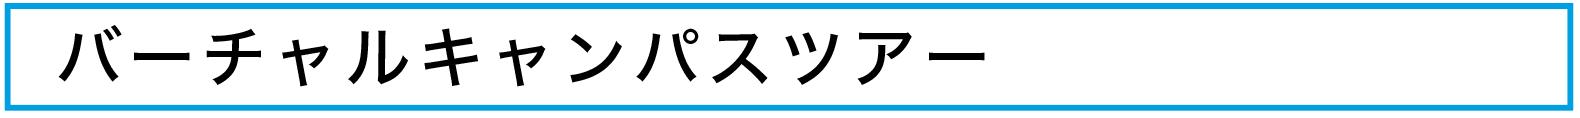 Webオープンキャンパス_施設紹介